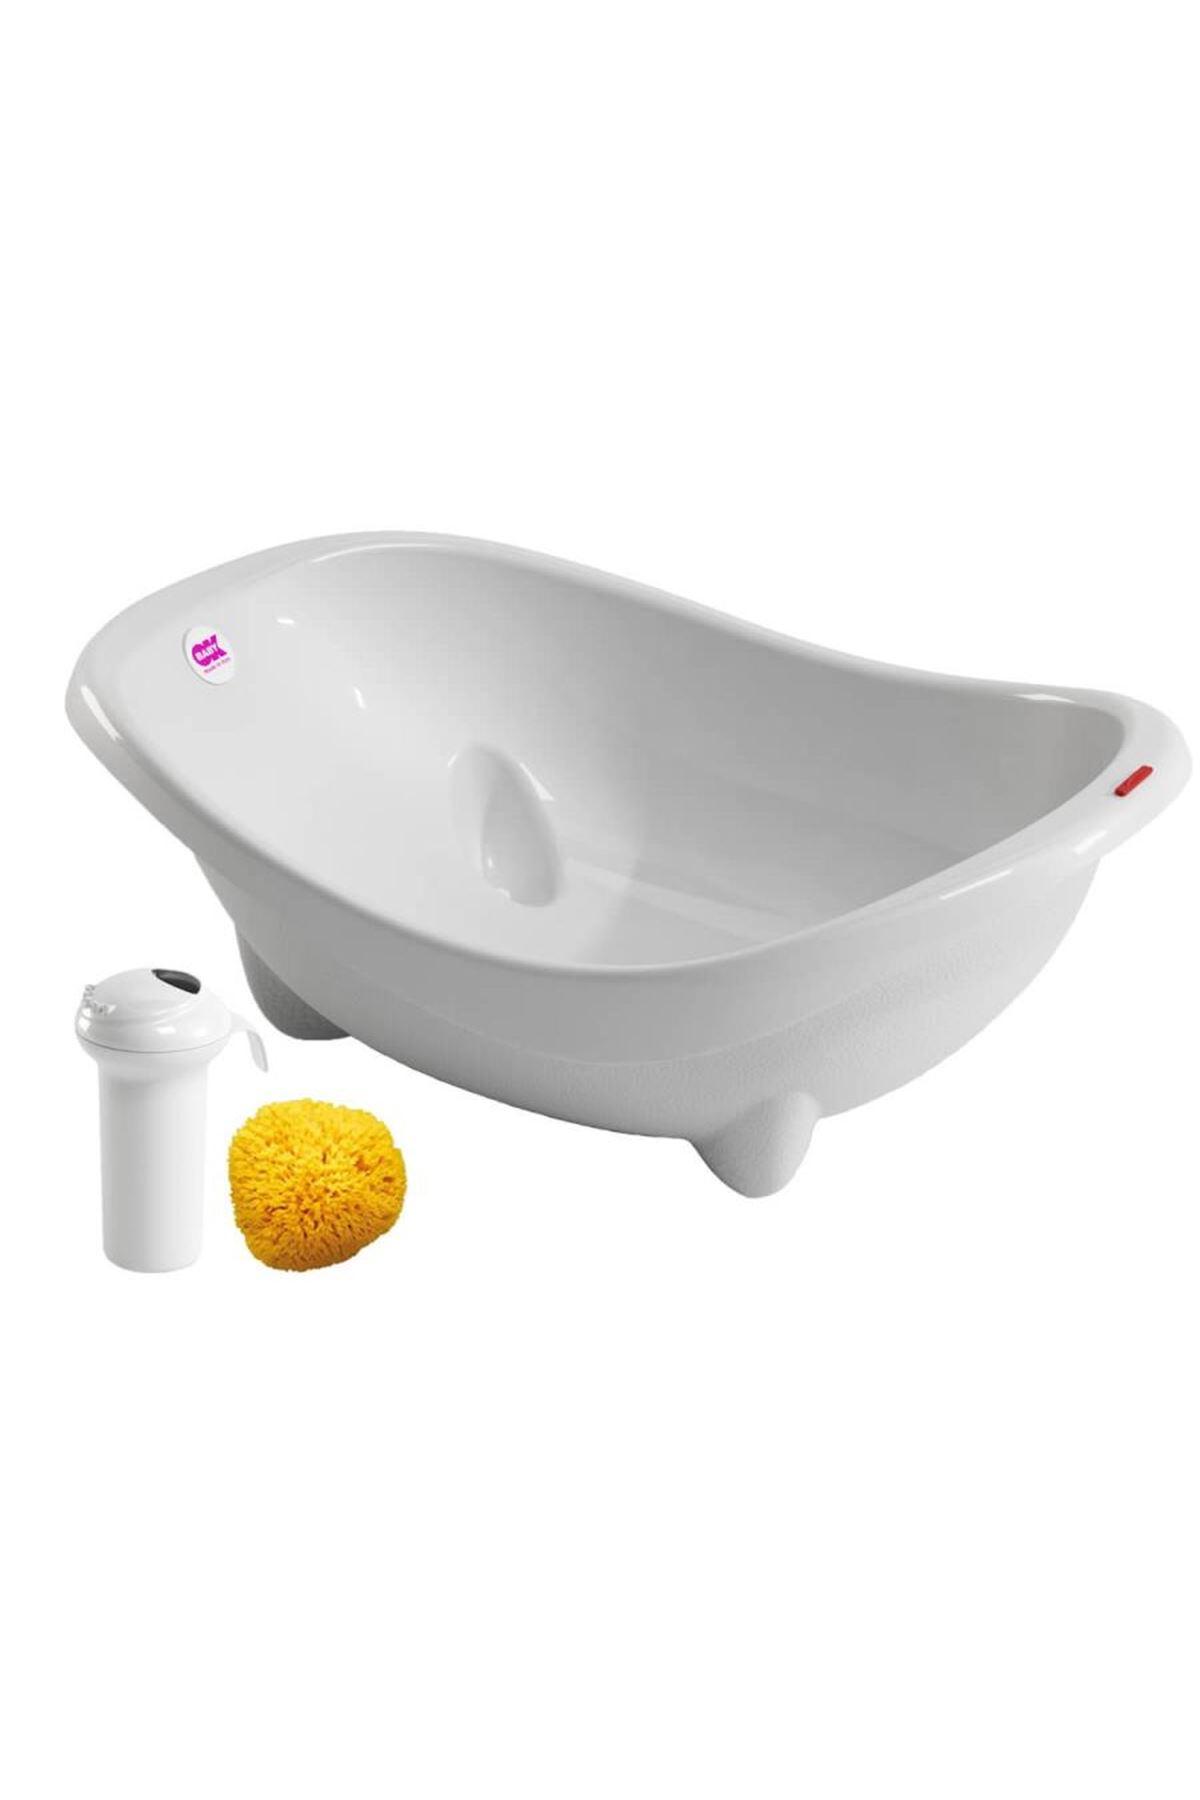 OkBaby Laguna Banyo Küveti & Splash Bebek Duşu & Doğal Banyo Süngeri No.10 / Beyaz